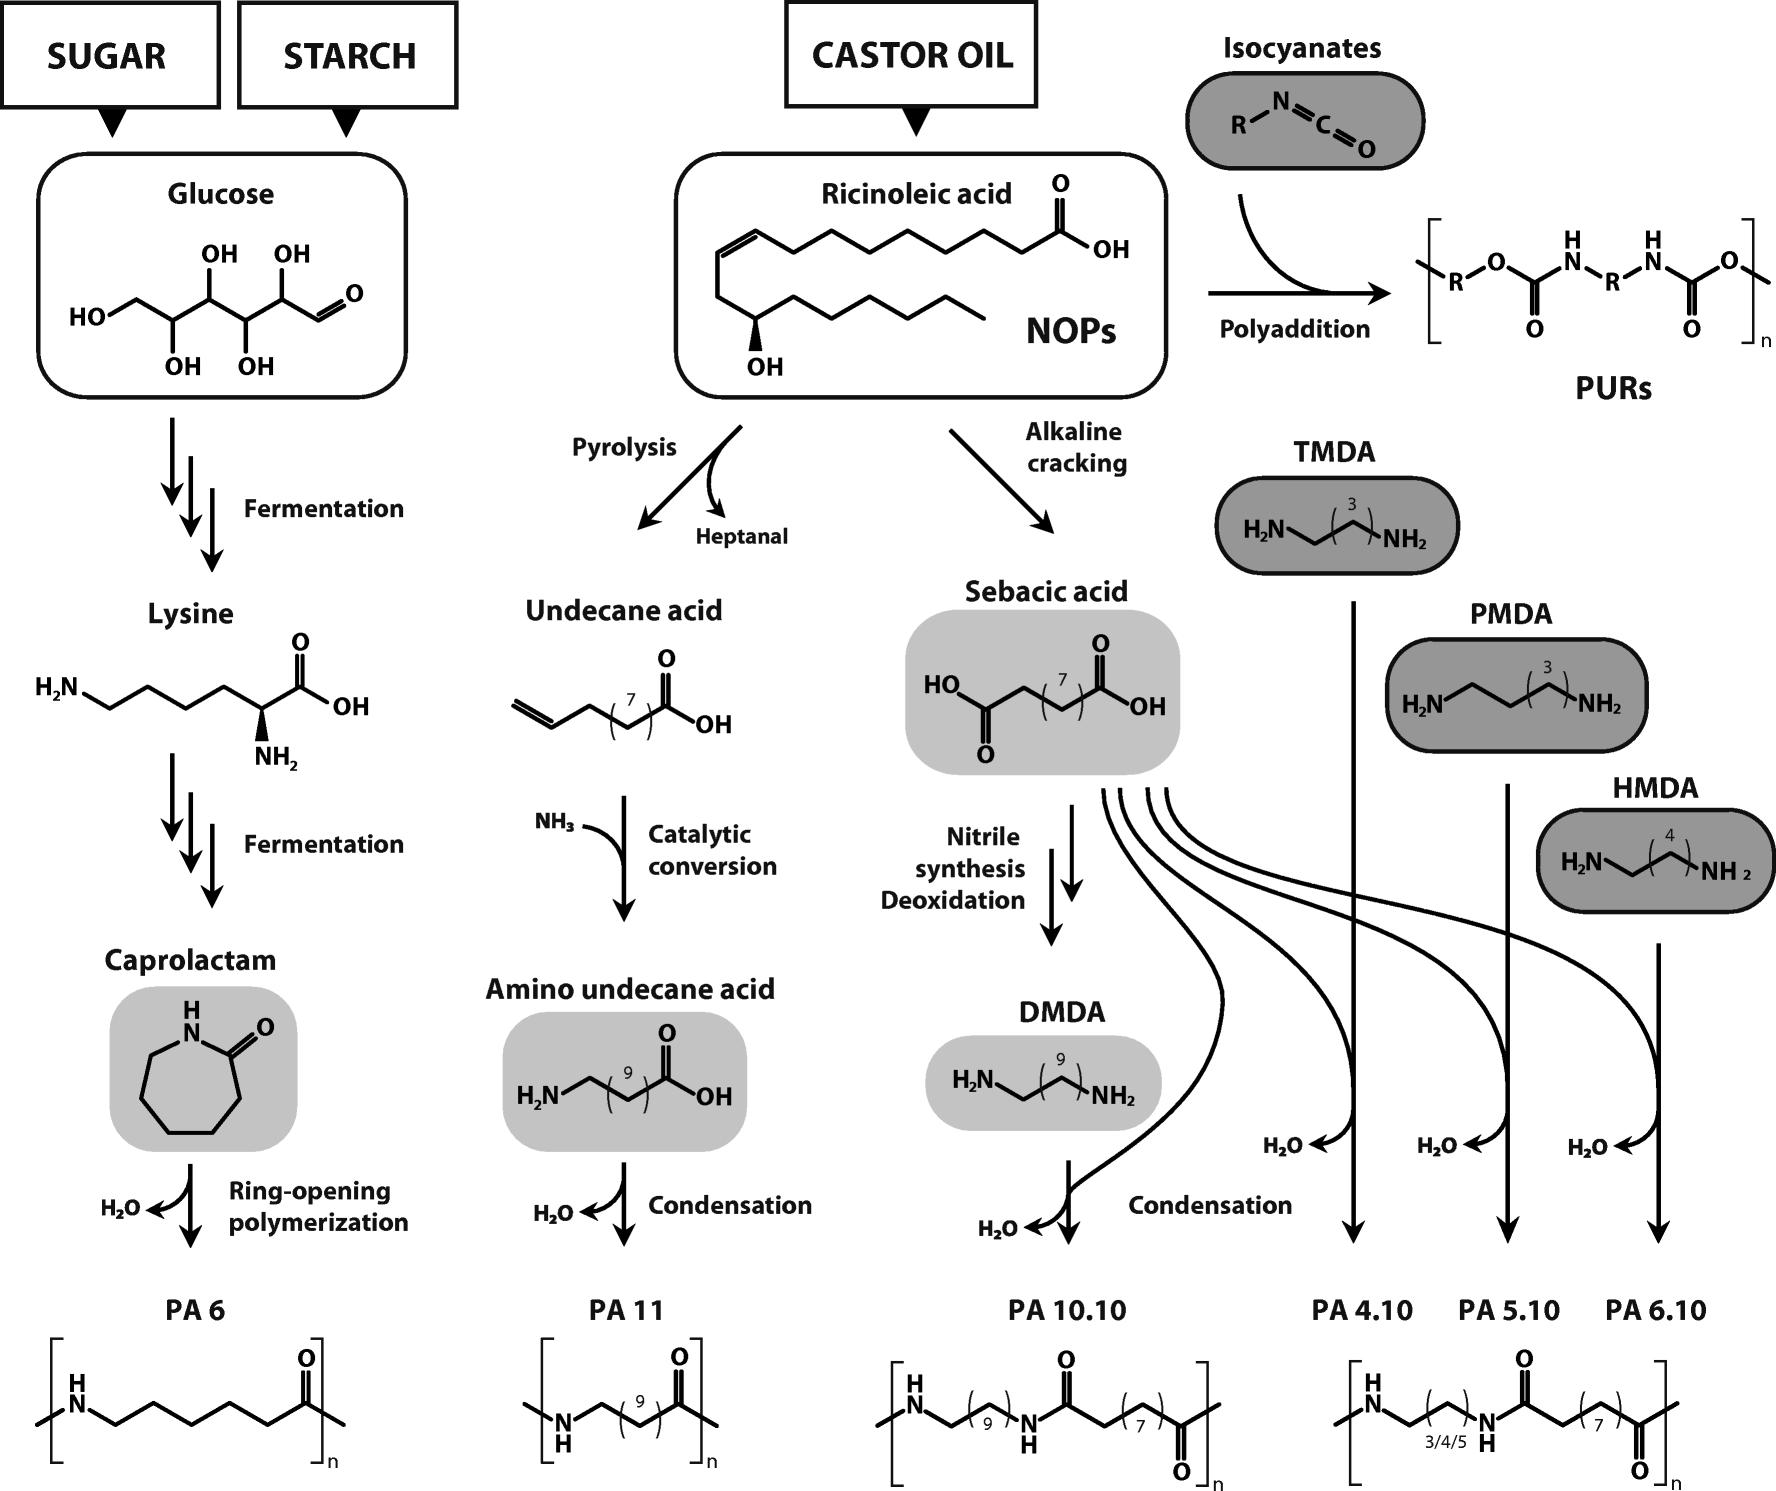 juoksukengät halpa hieno tyyli Recent developments in non-biodegradable biopolymers ...